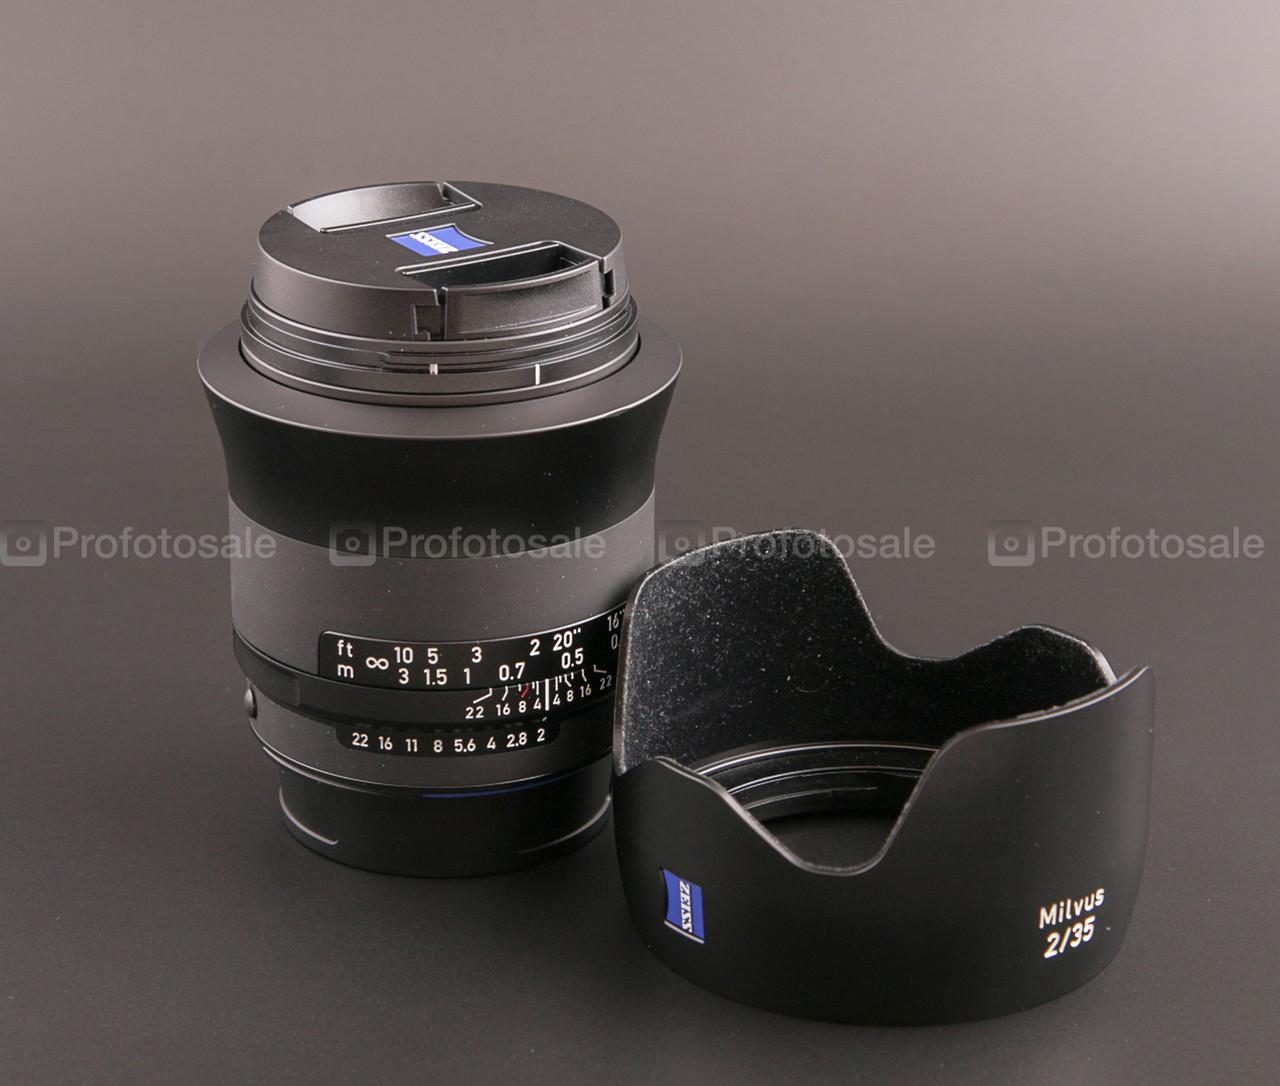 ZEISS Milvus 2/35 ZF.2-mount (Nikon)